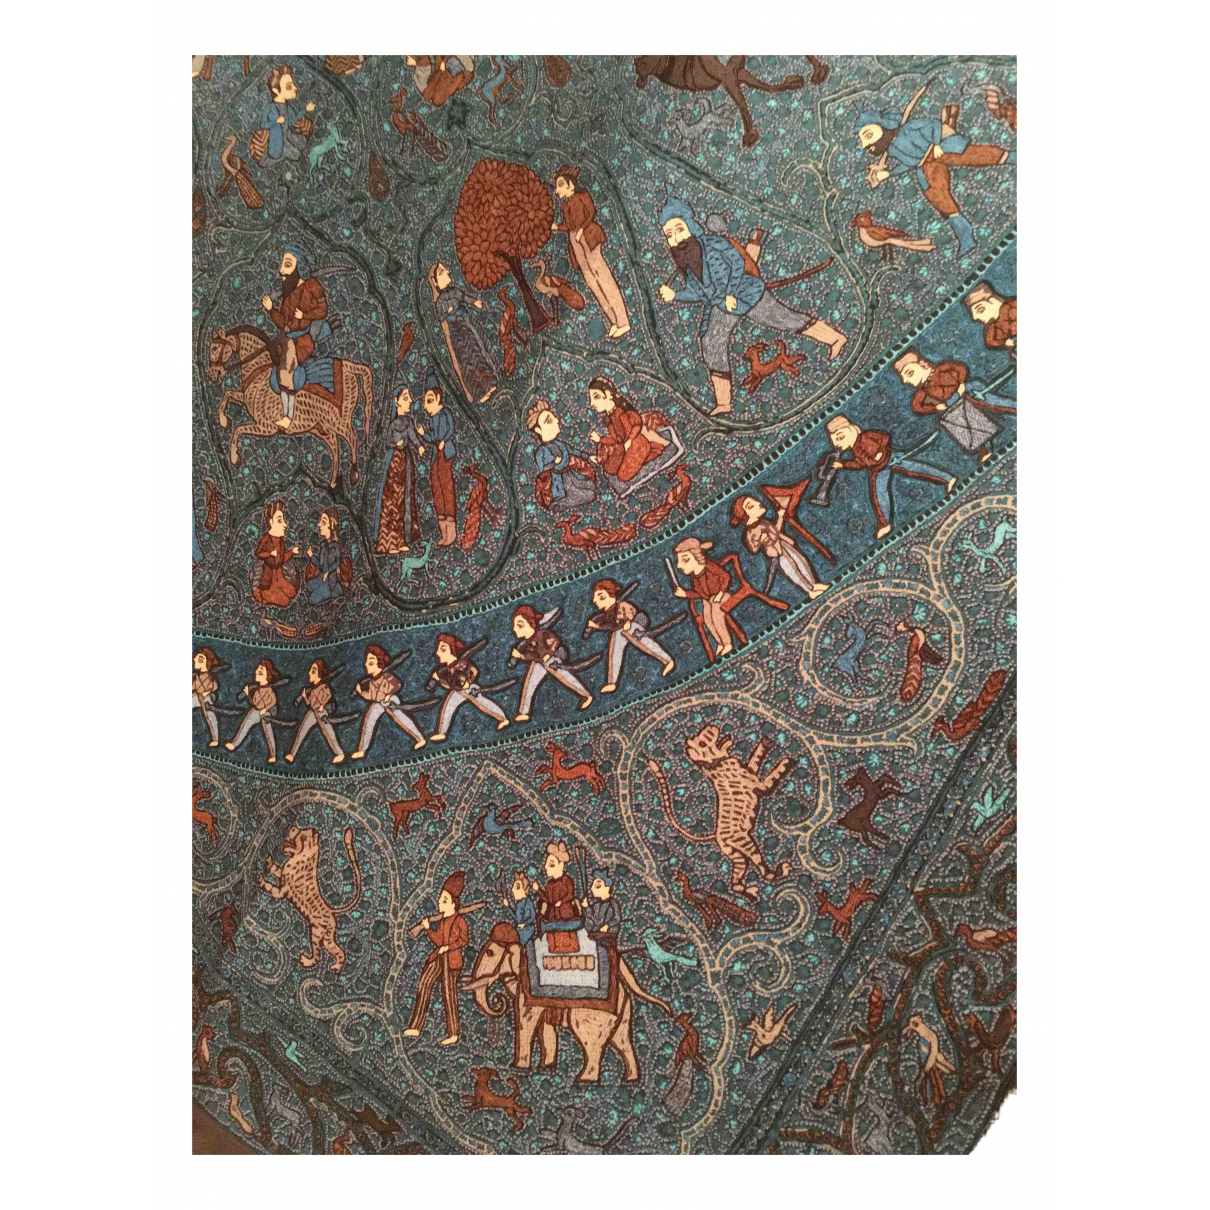 Estola Carre Geant silk 140 de Seda Hermes